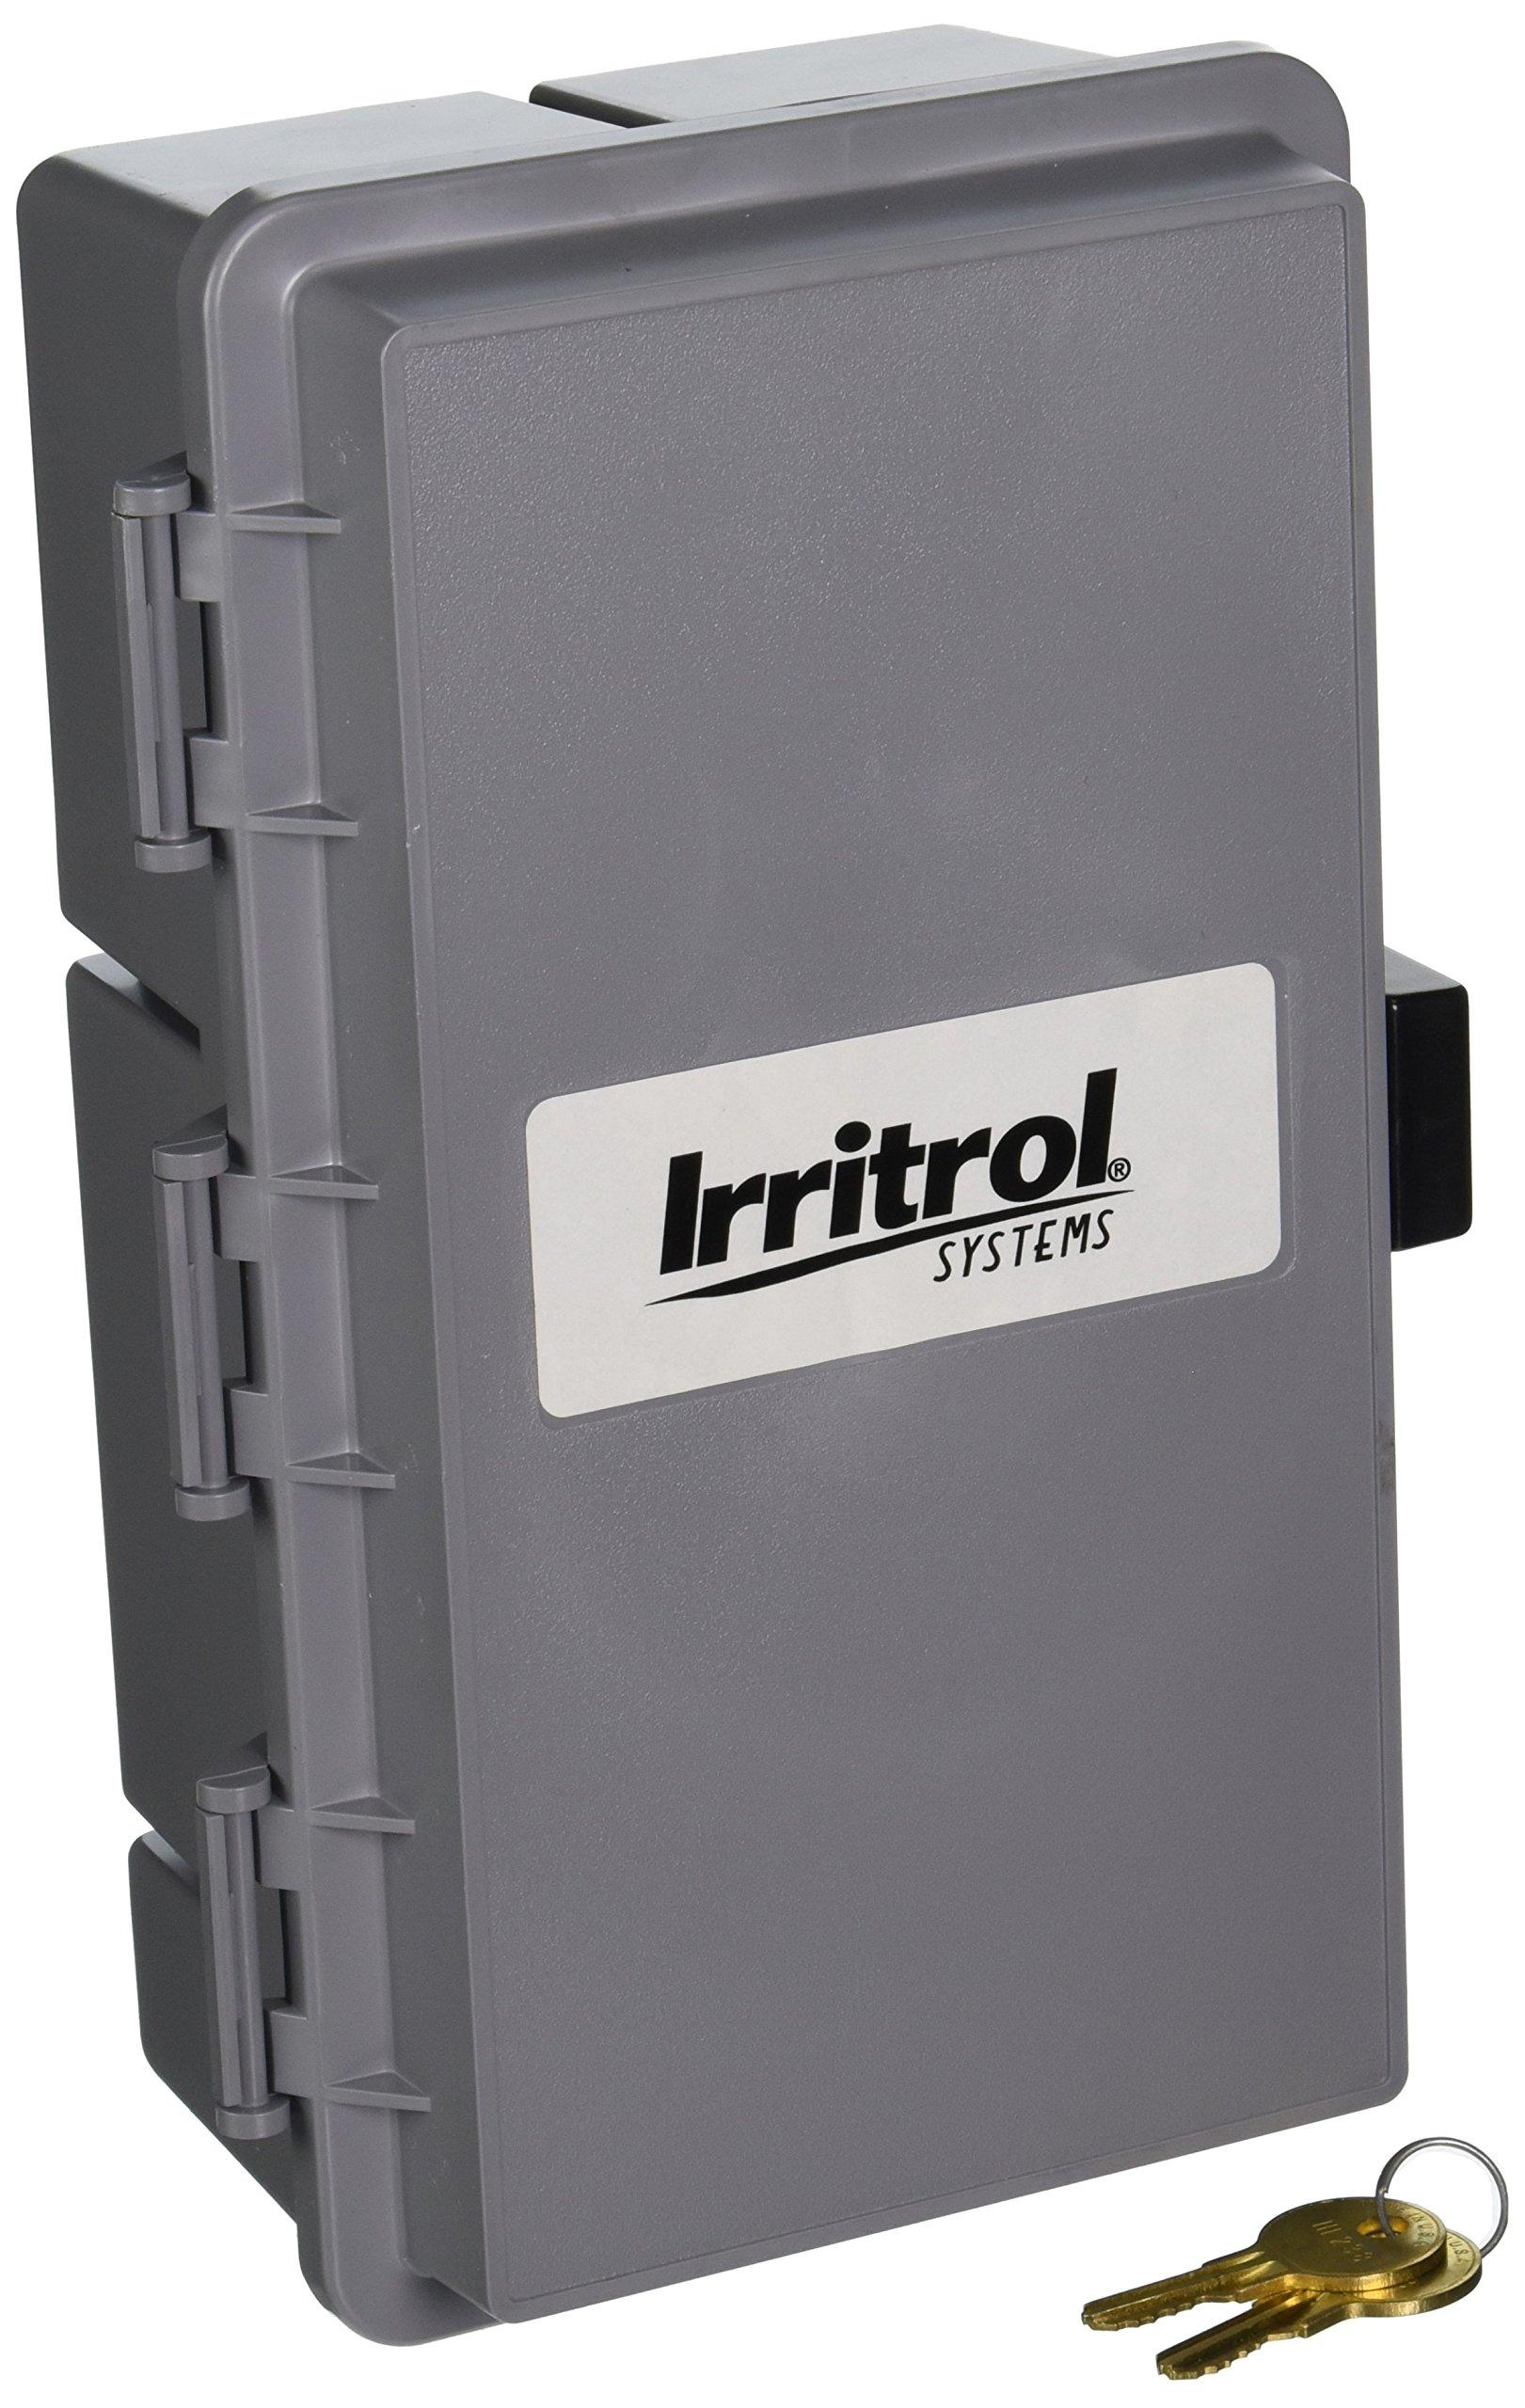 Irritrol SR-1 Pump Start Relay